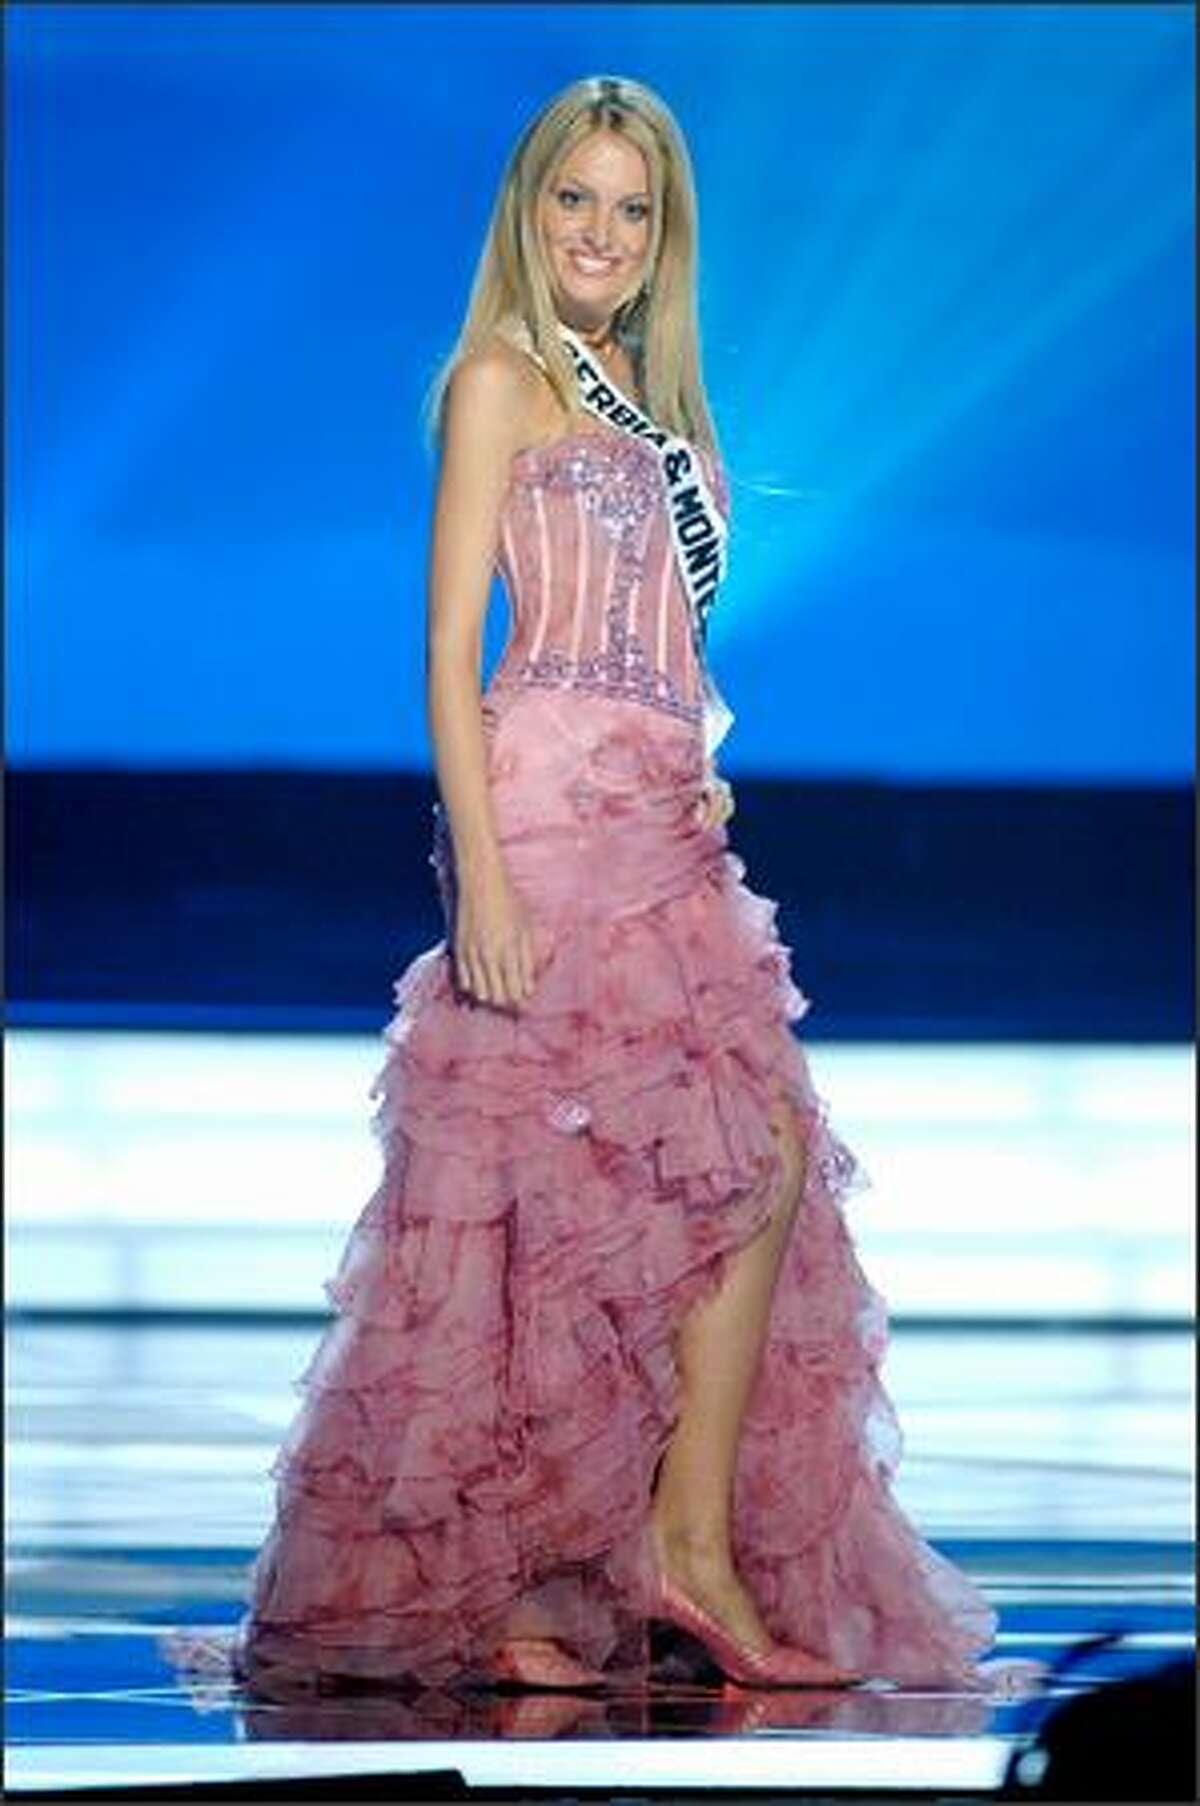 Jelena Mandic, Miss Serbia & Montenegro.